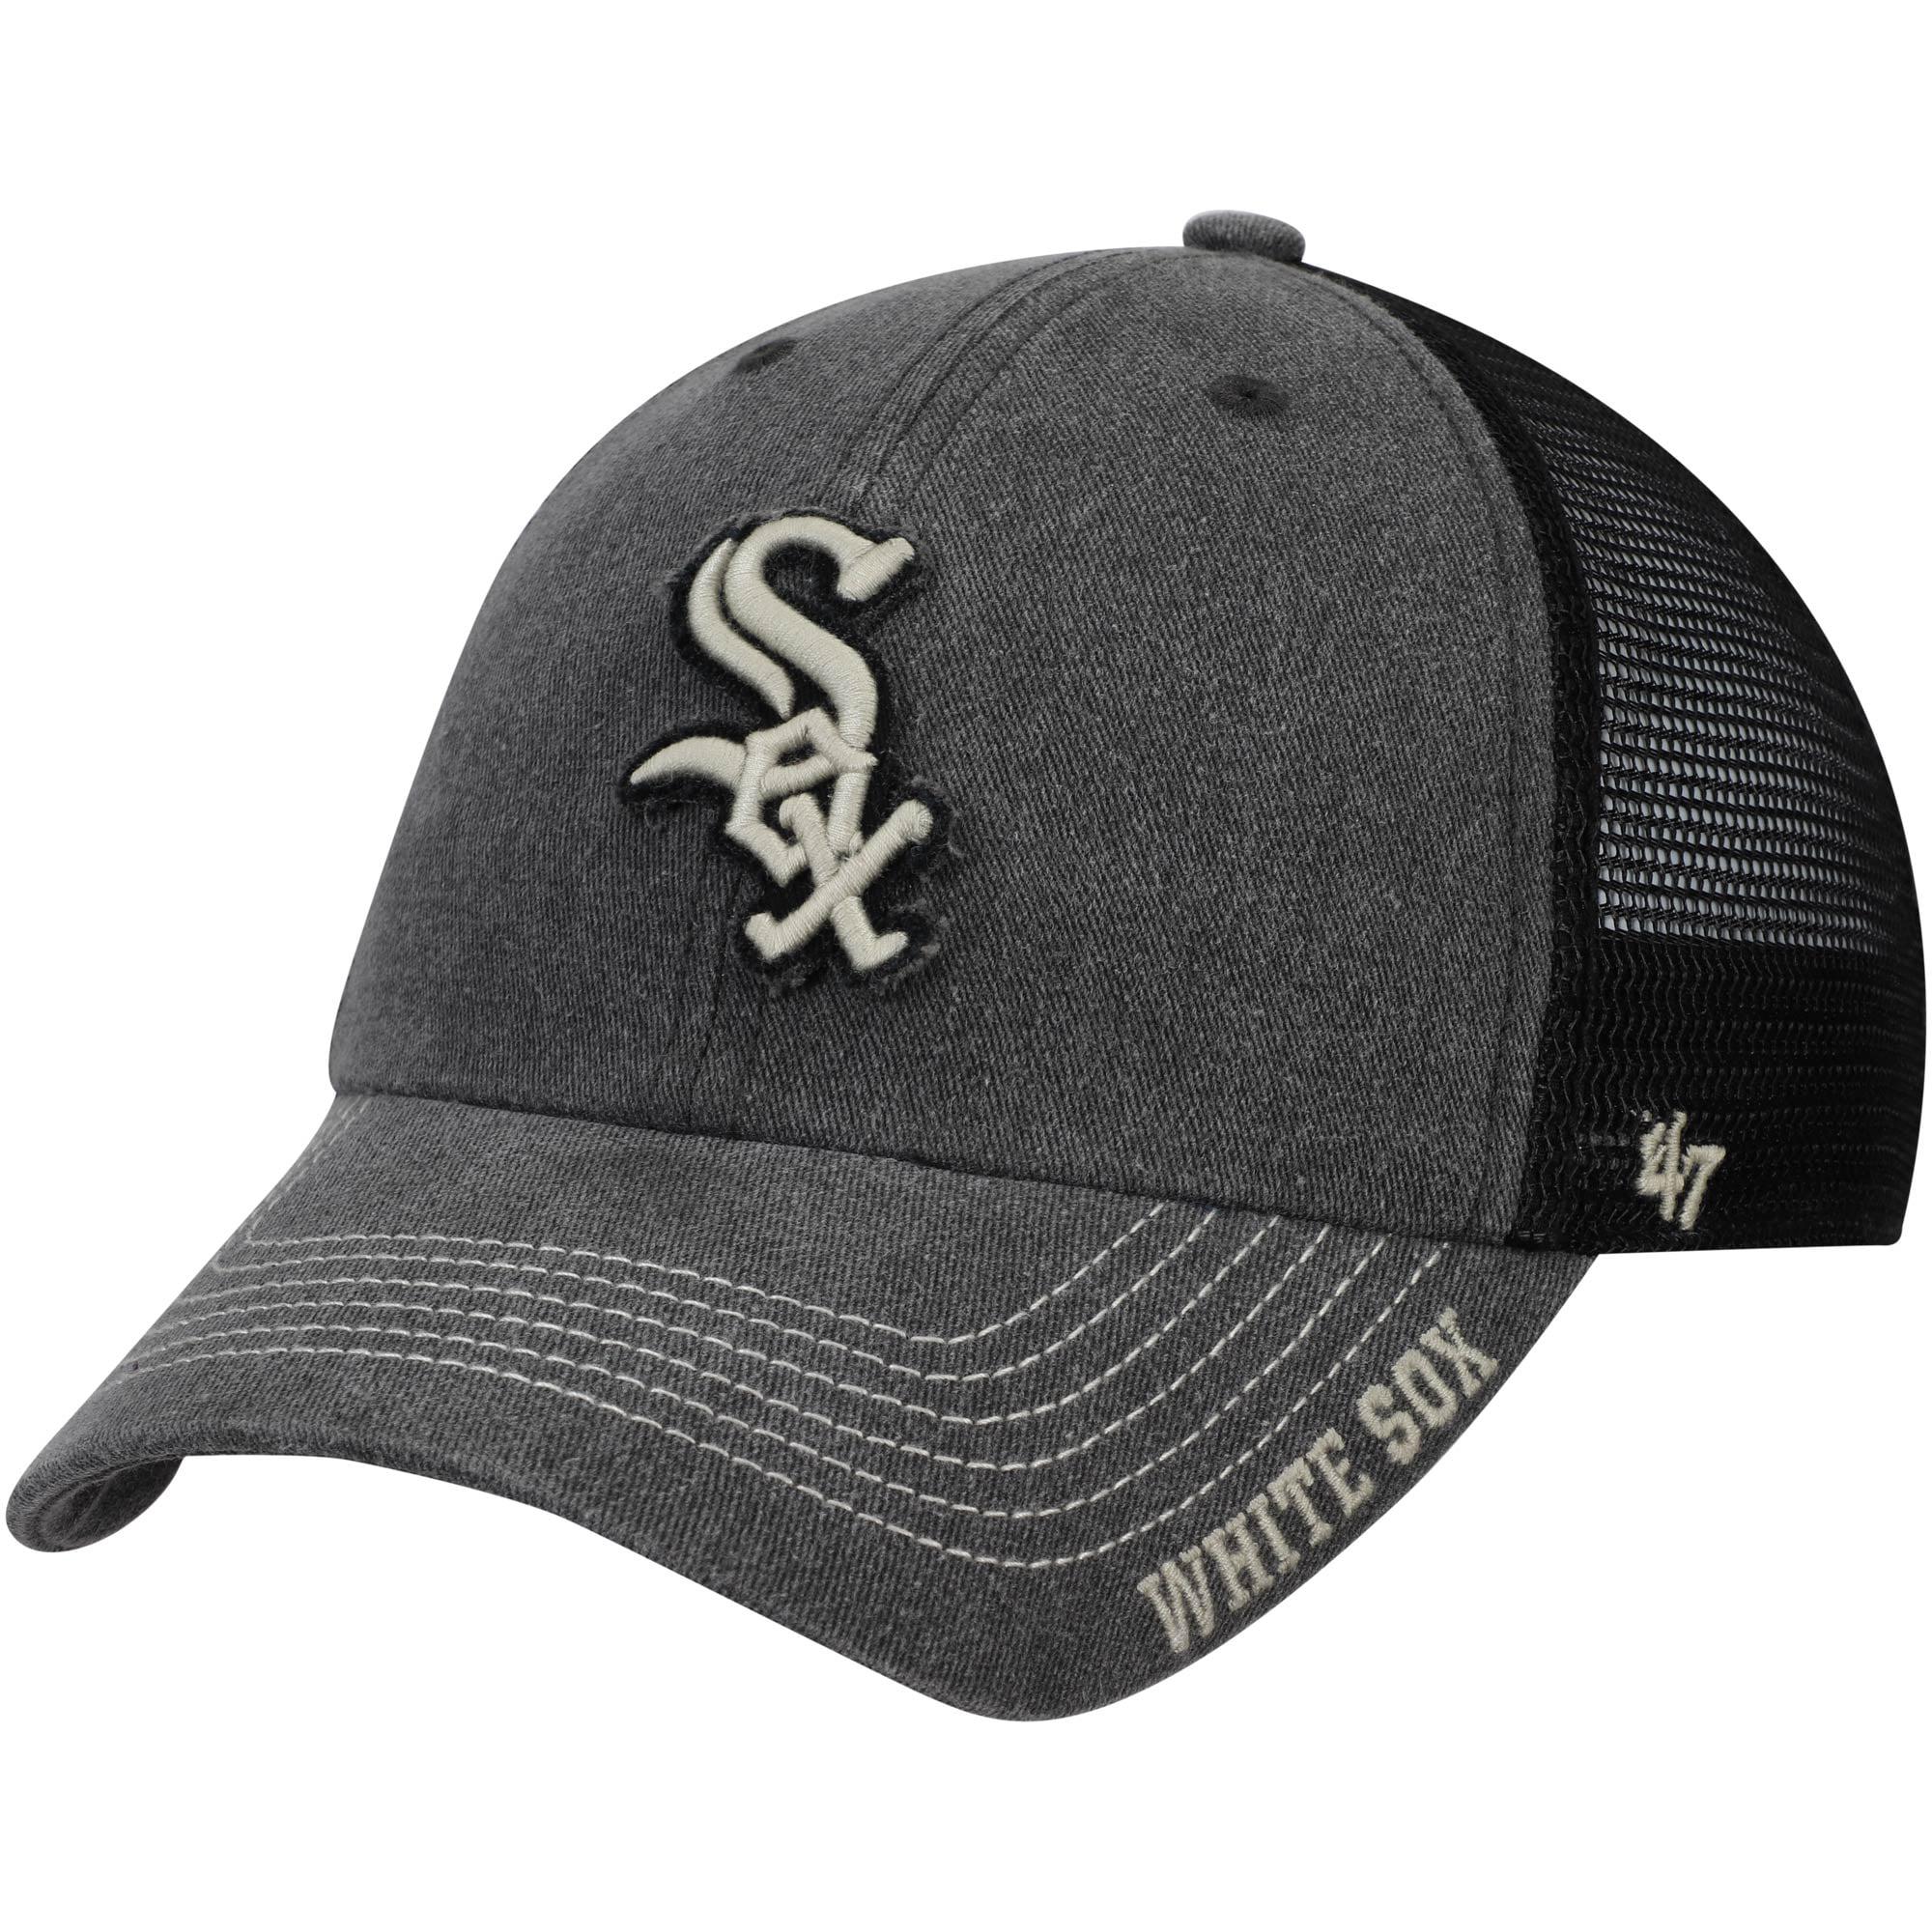 8b20c136 ... top quality chicago white sox 47 burnstead clean up trucker adjustable  hat black osfa ed792 633b9